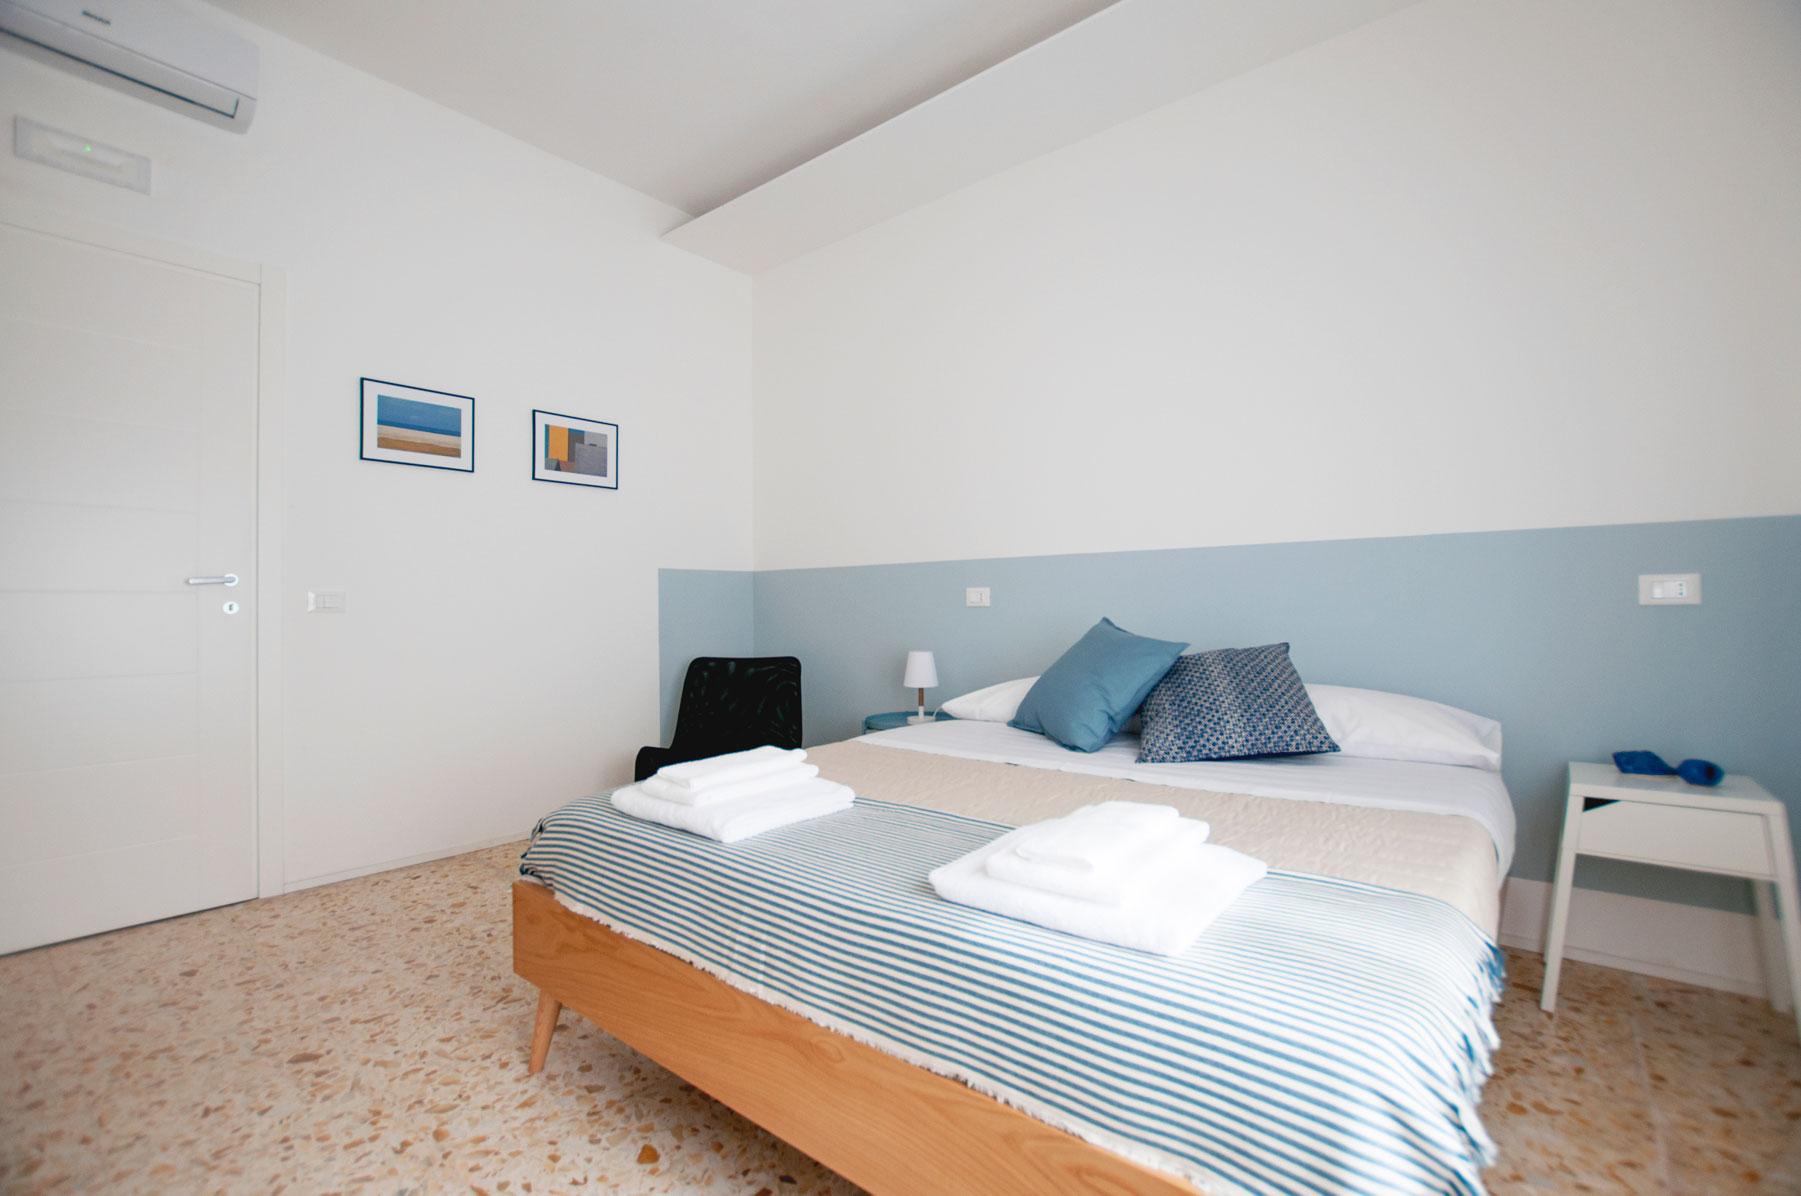 letto-camera-2-casa27-b&b-terracina